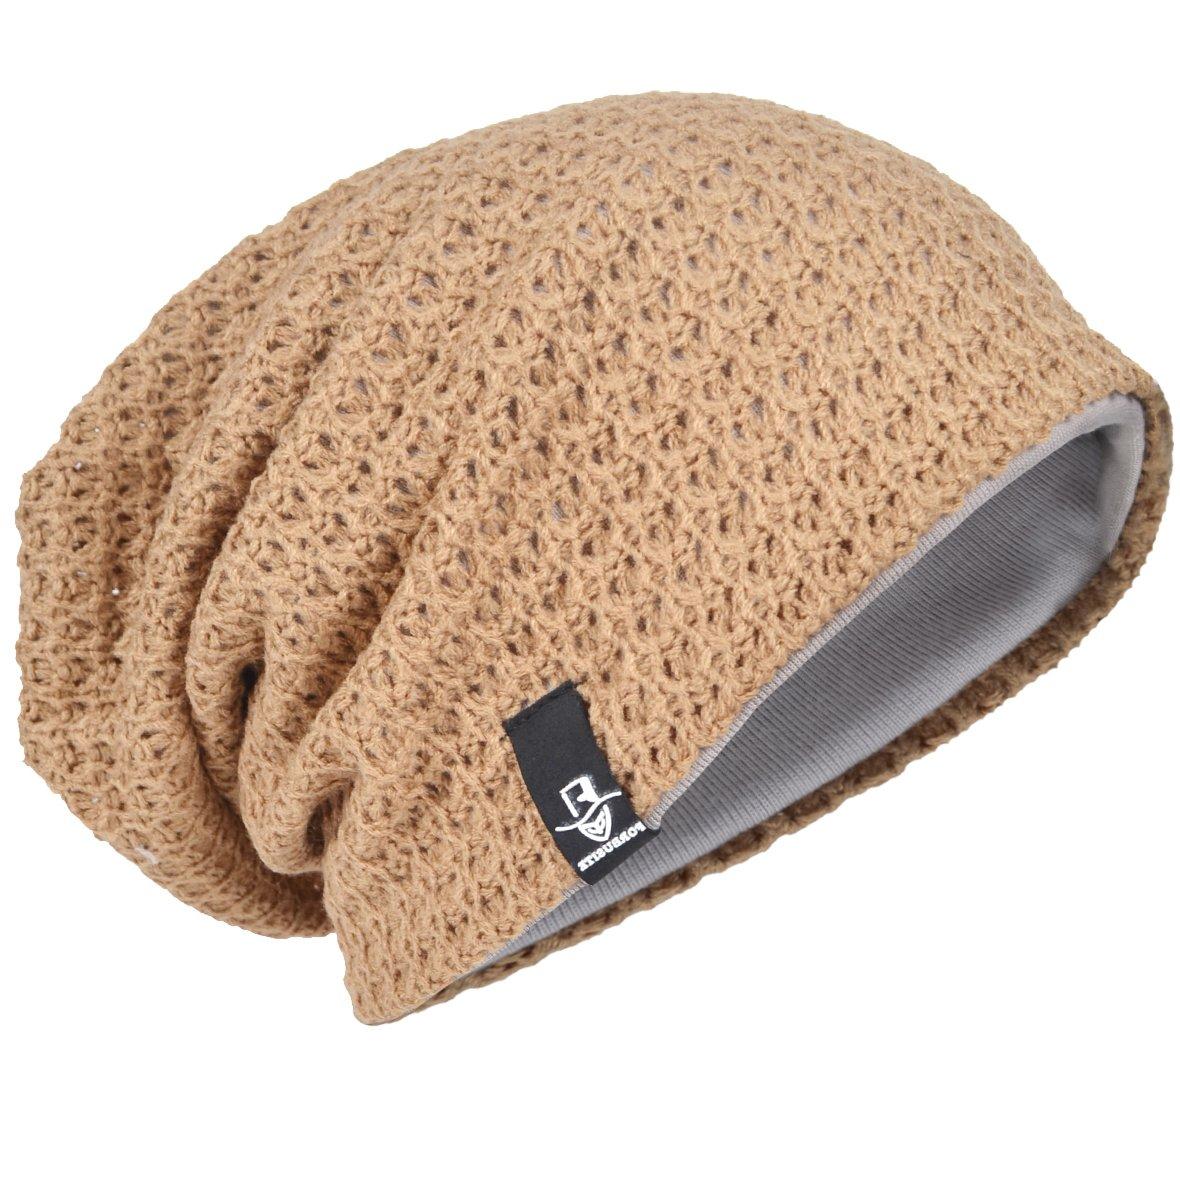 88c638e9105 Men Oversize Beanie Slouch Skull Knit Large Baggy Cap Ski Hat B08 (Beige)   Amazon.co.uk  Clothing